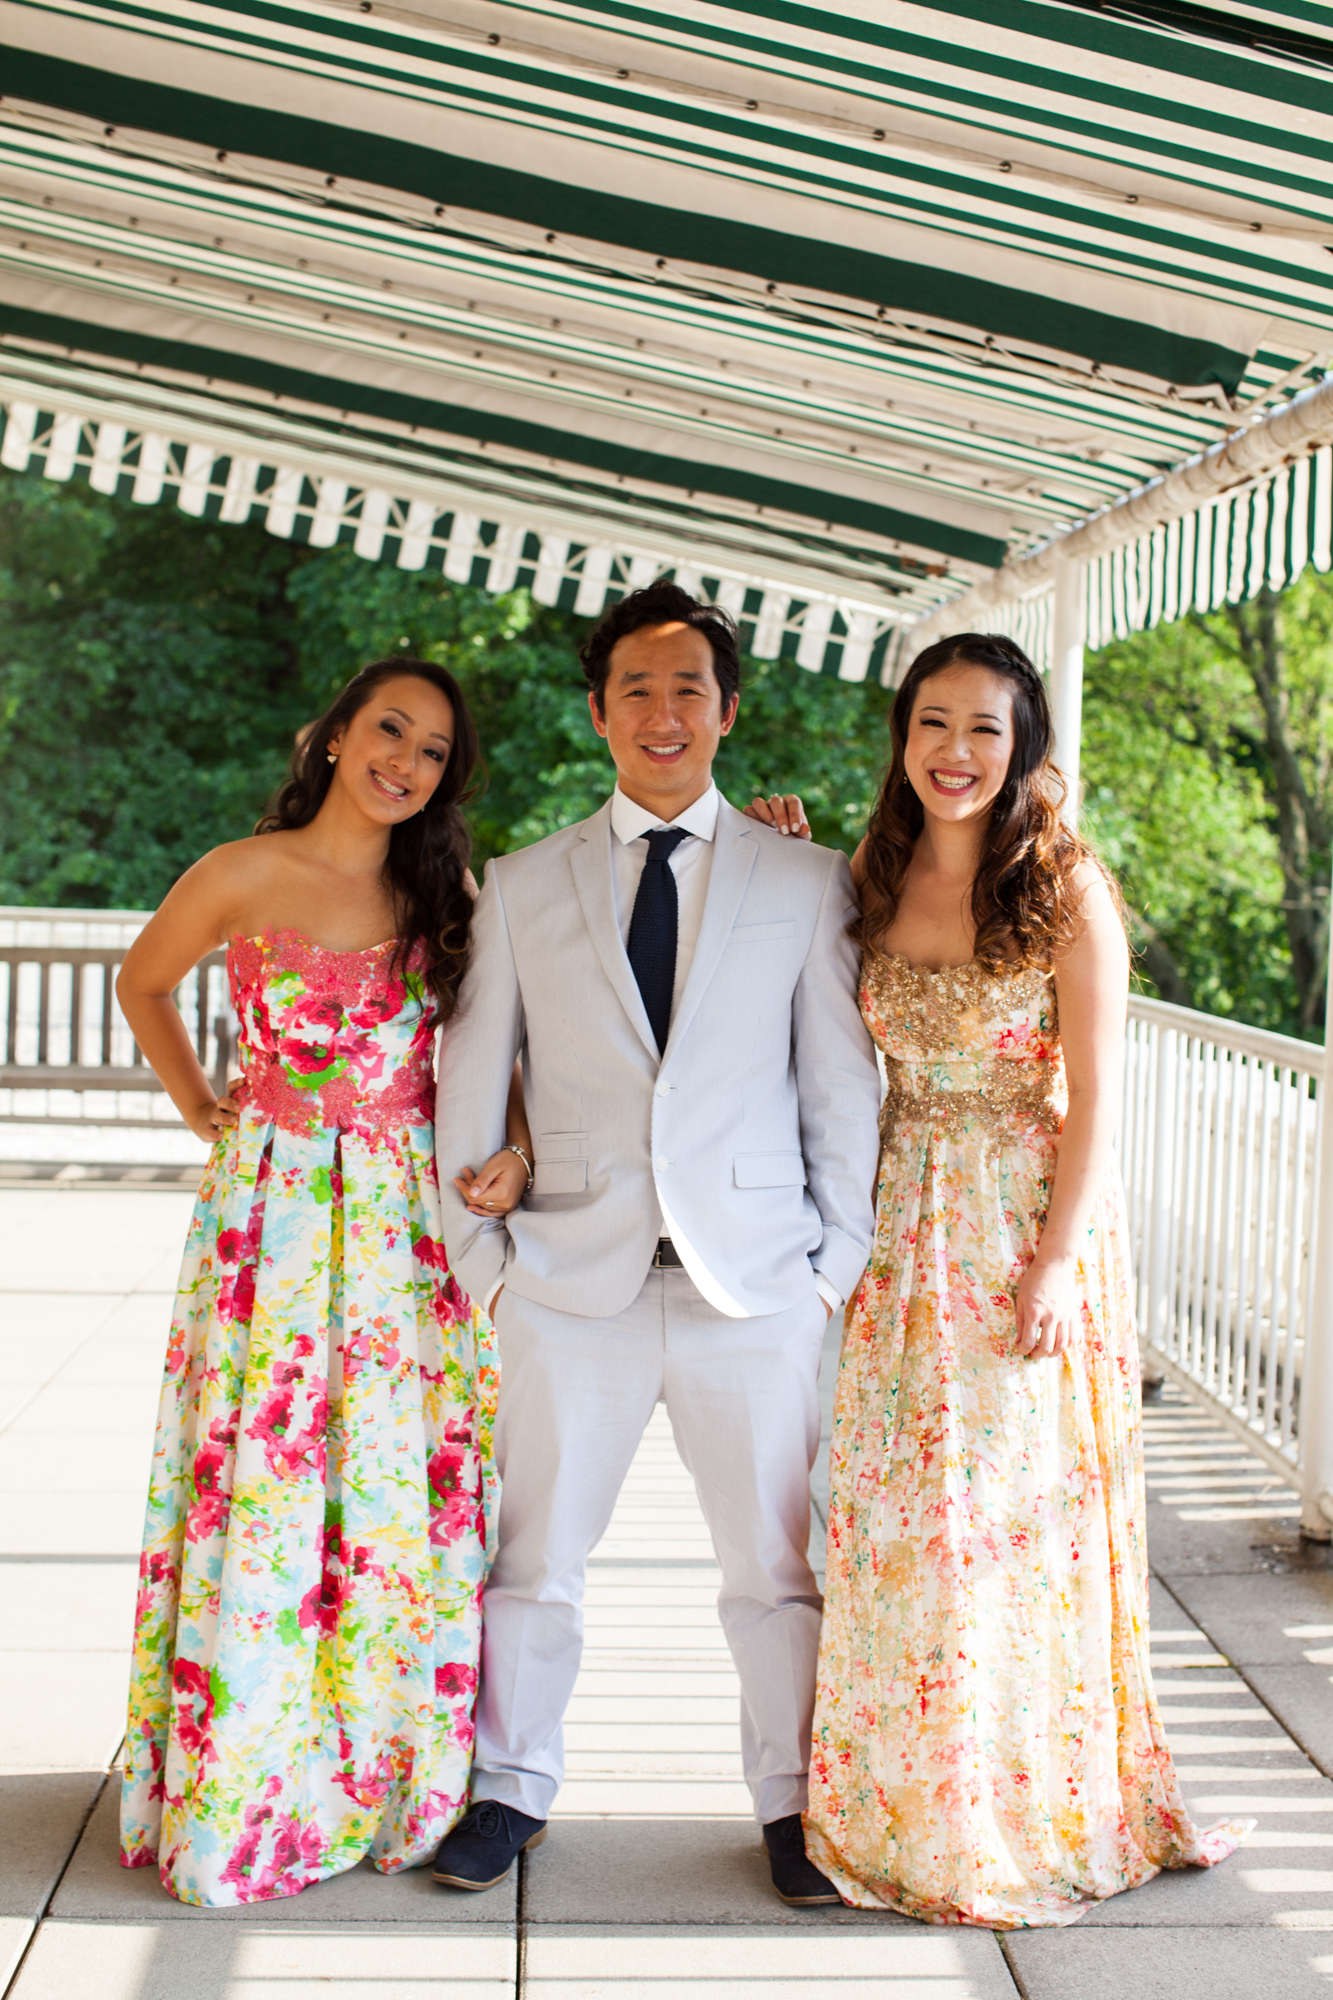 HeatherPhelpsLipton-Modern-Wedding-Photography-ProspectPark-PicnicHouse-summer-19.jpg